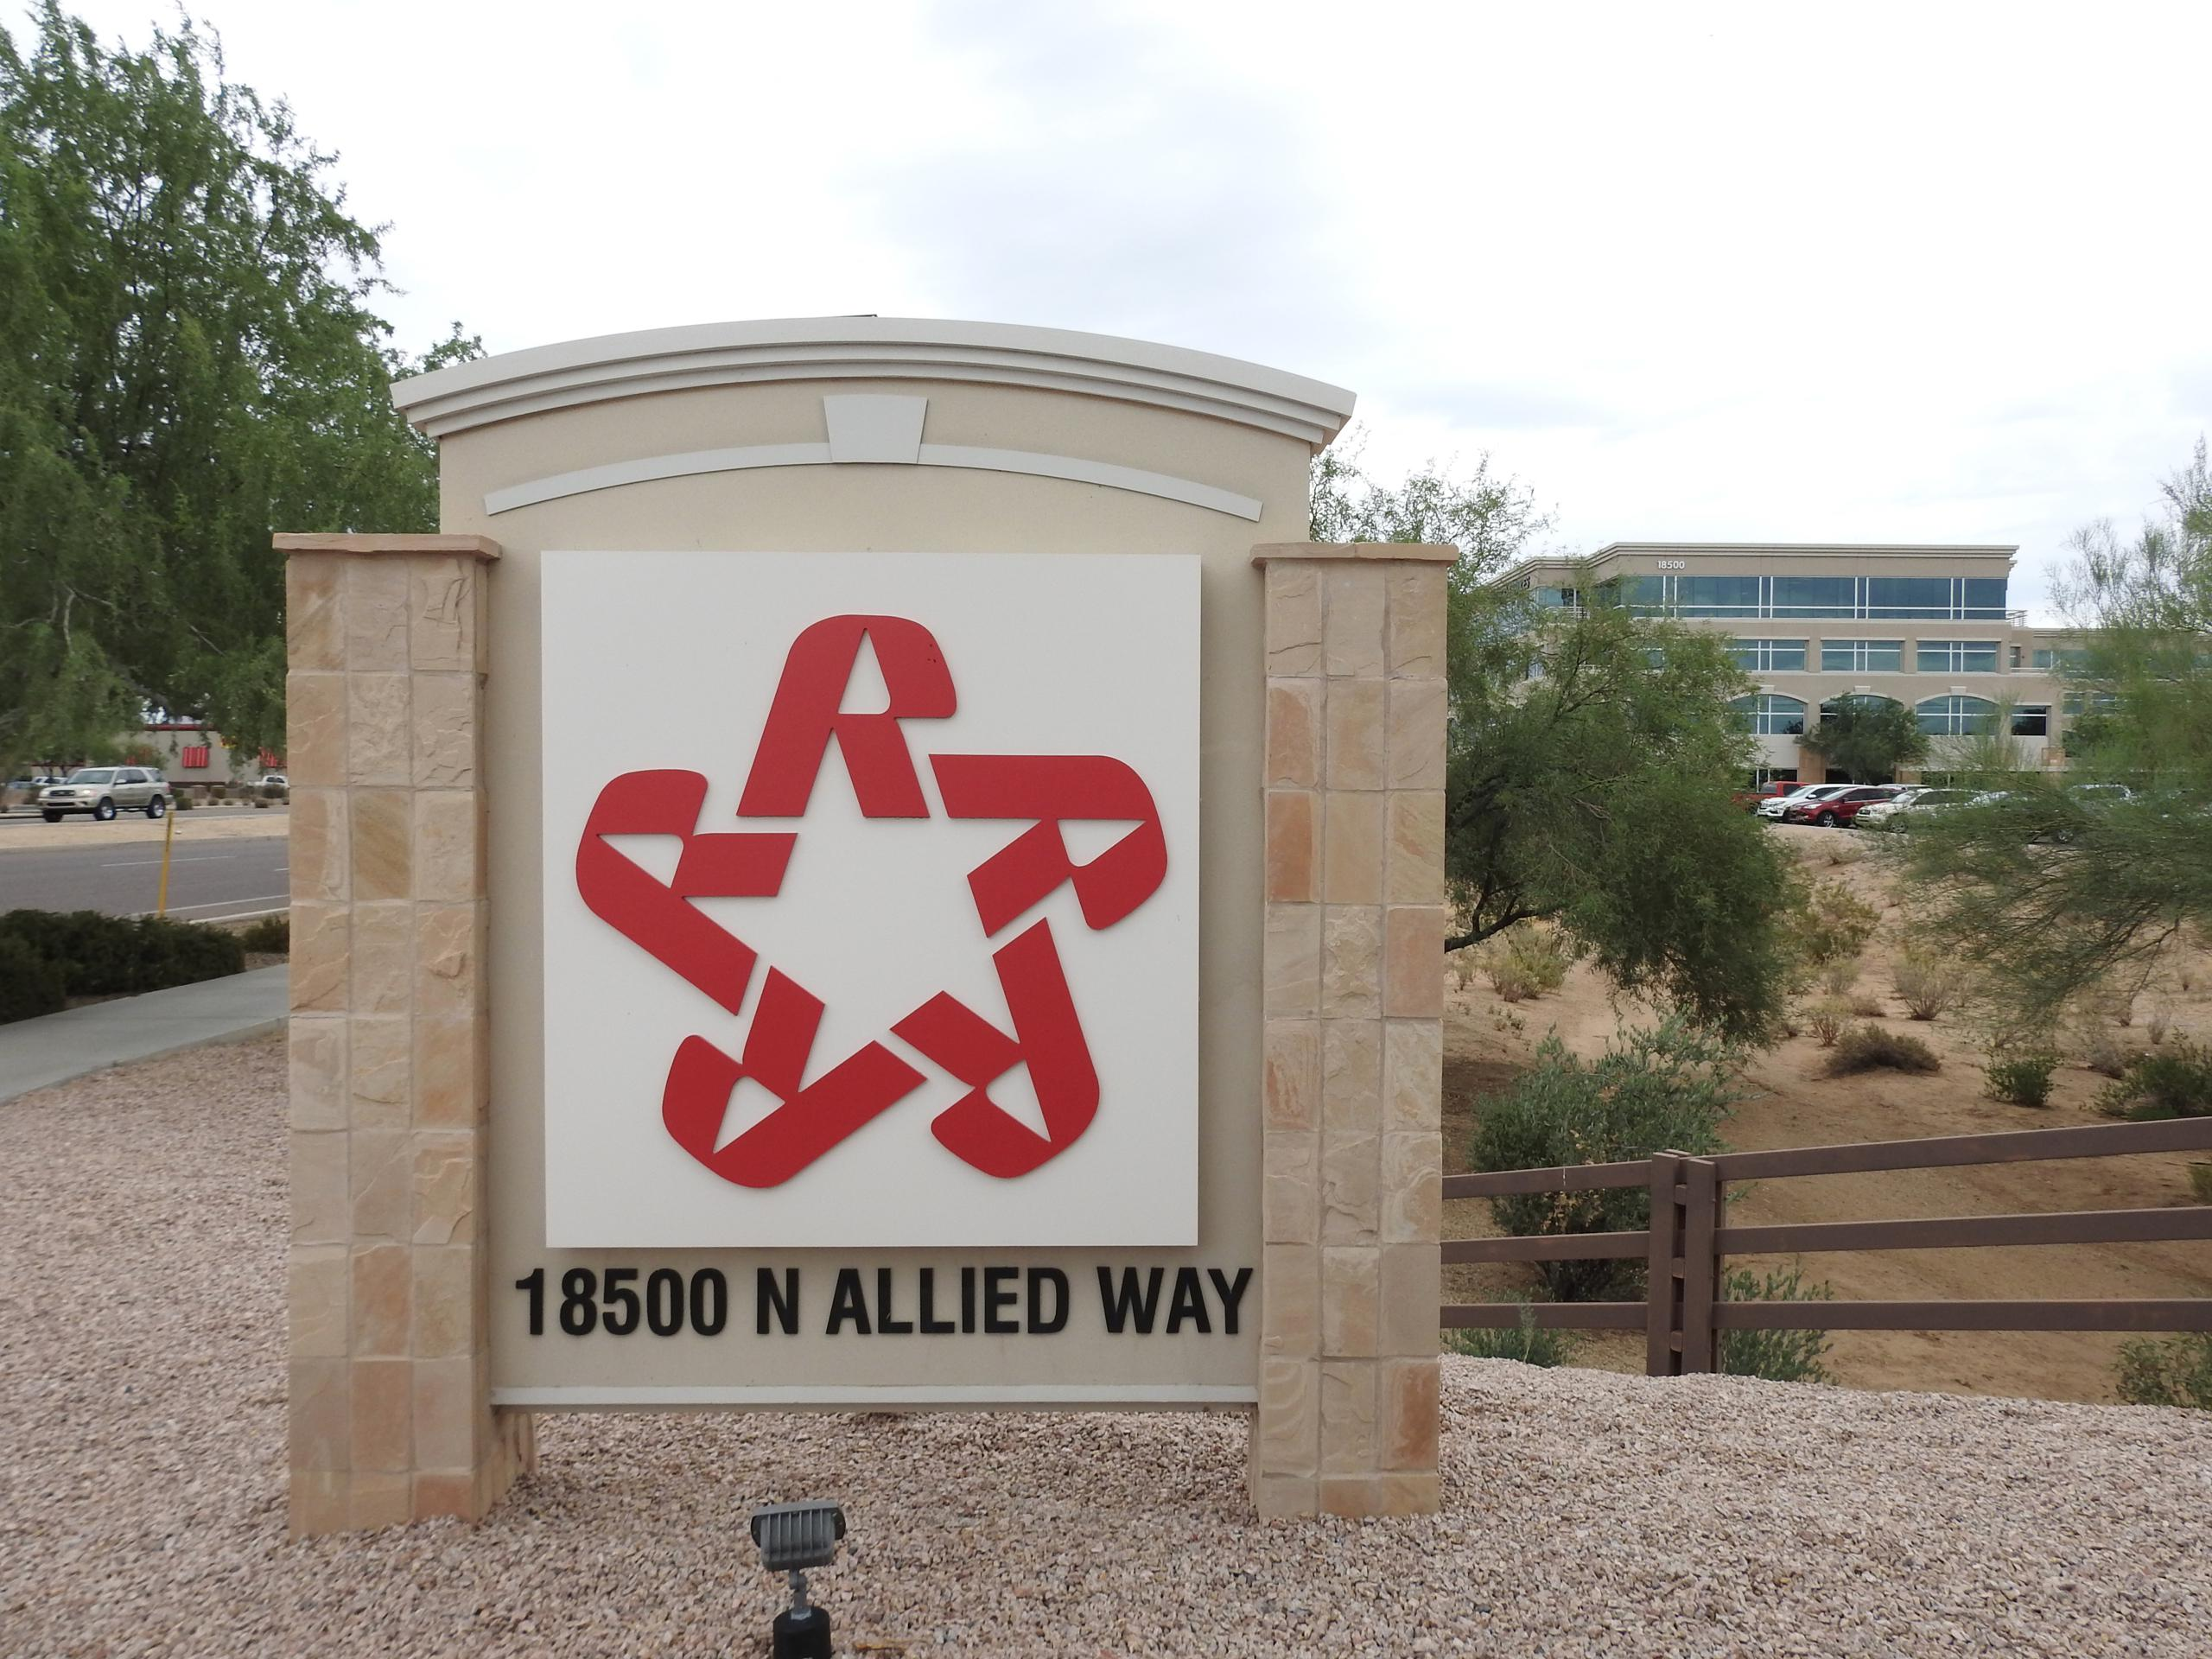 Entrance to Republic Services' corporate headquarters in Phoenix, Arizona.